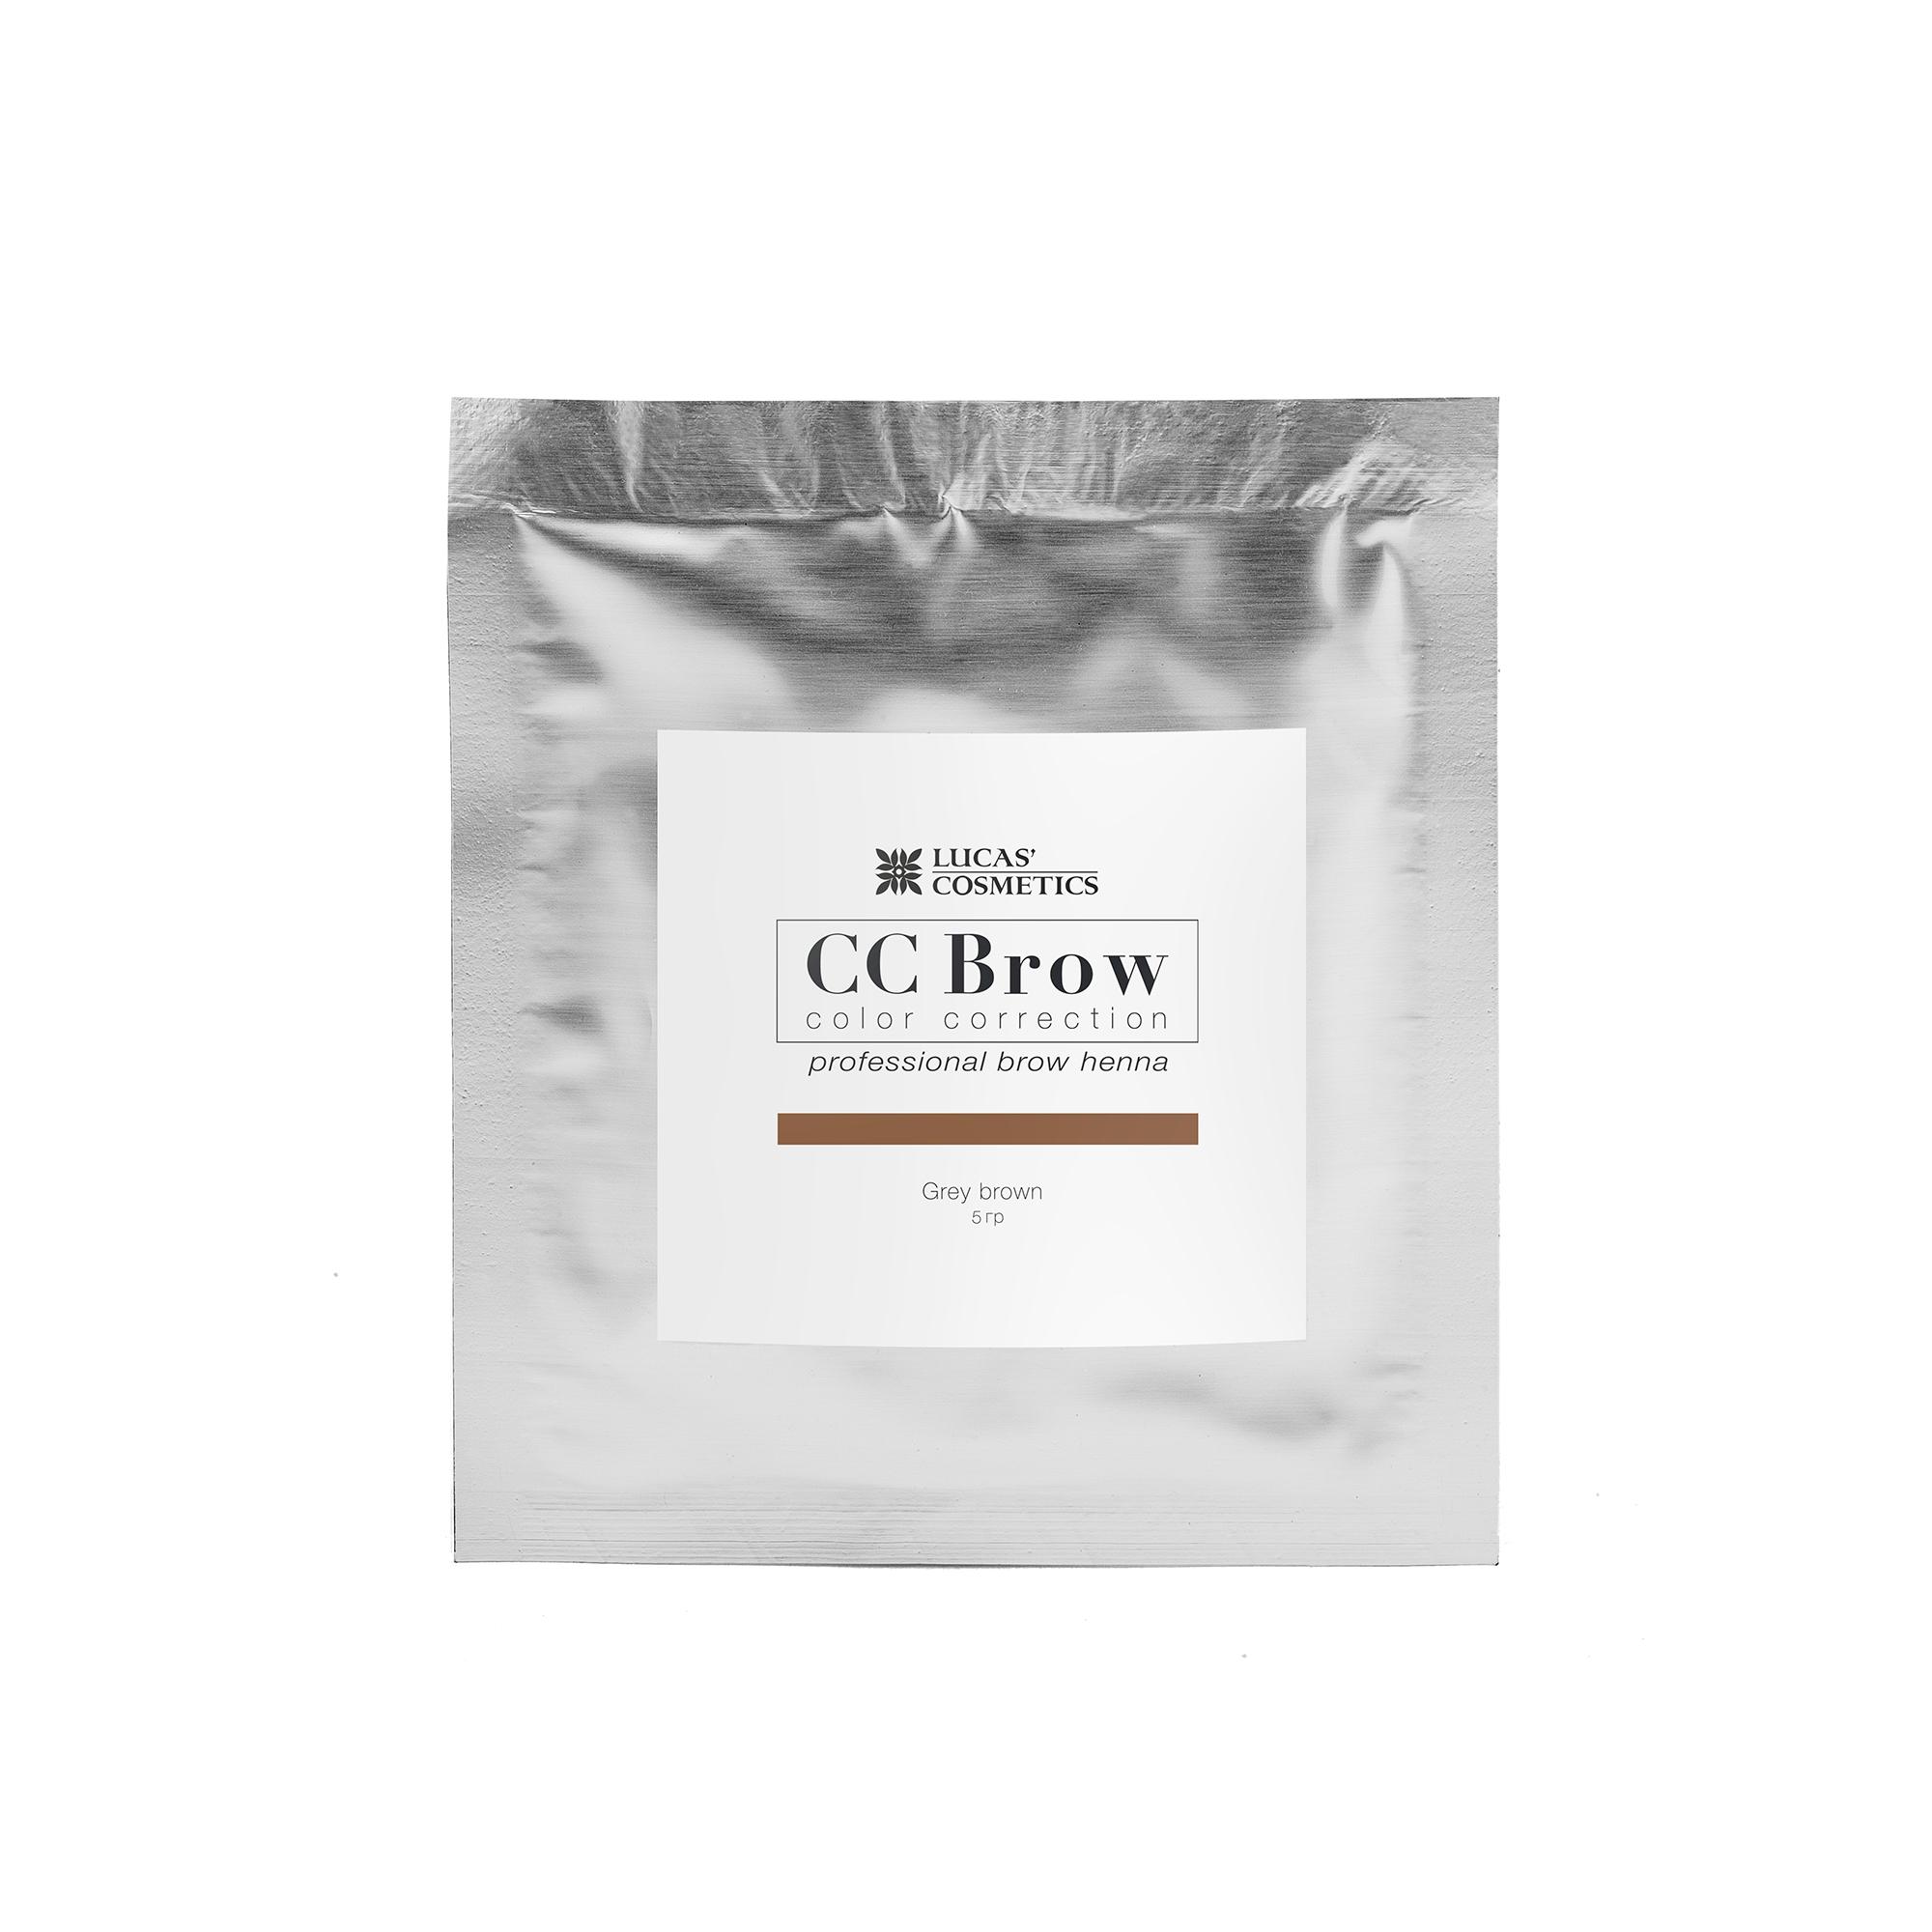 LUCAS' COSMETICS Хна для бровей в саше (серо-коричневый) / CC Brow (grey brown), 5 гр -  Краски для бровей